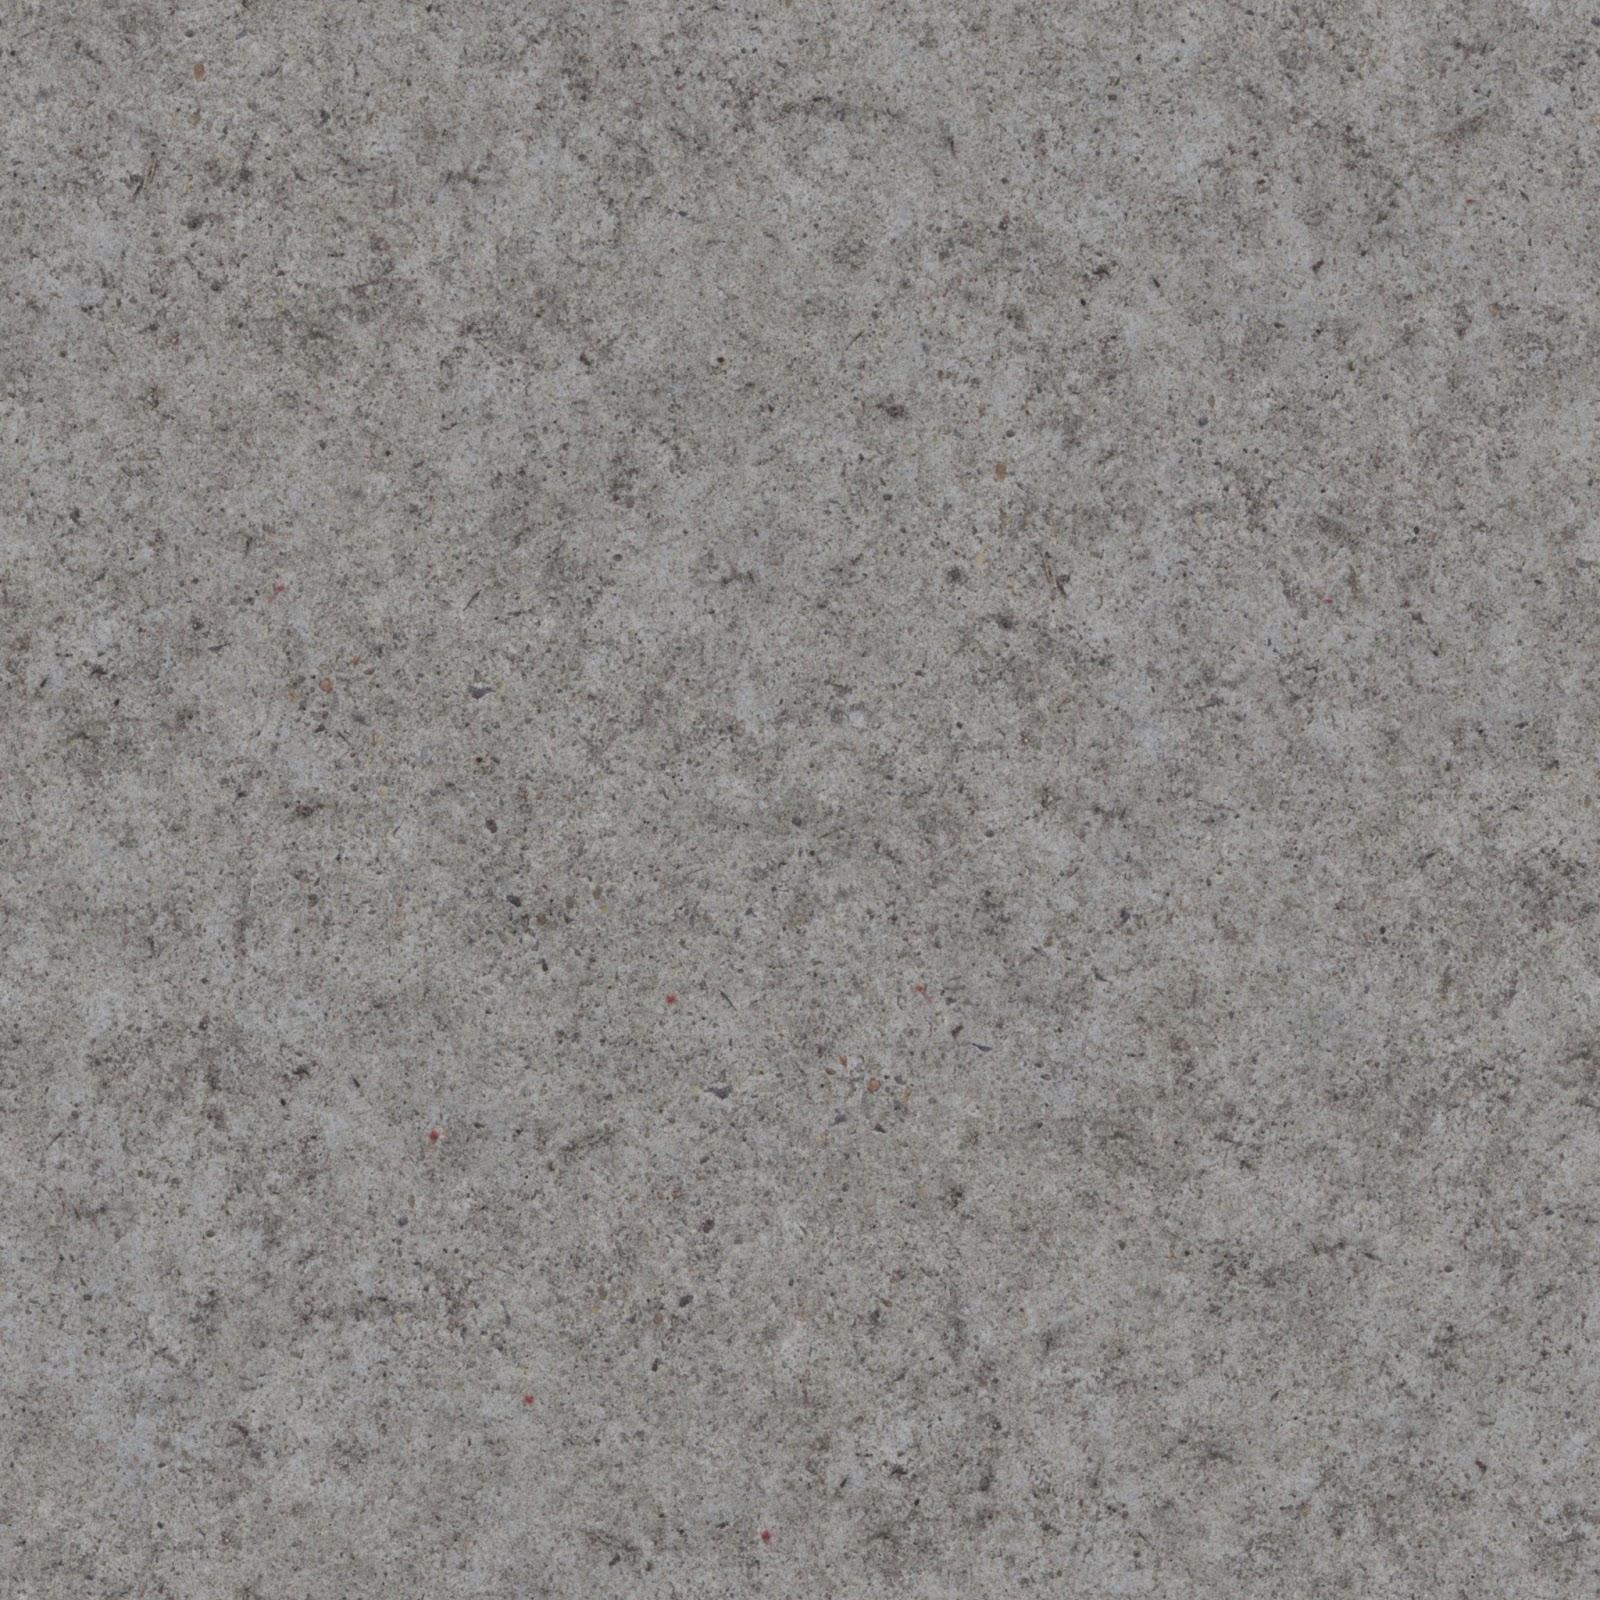 Concrete granite wall flat seamless texture 2048x2048